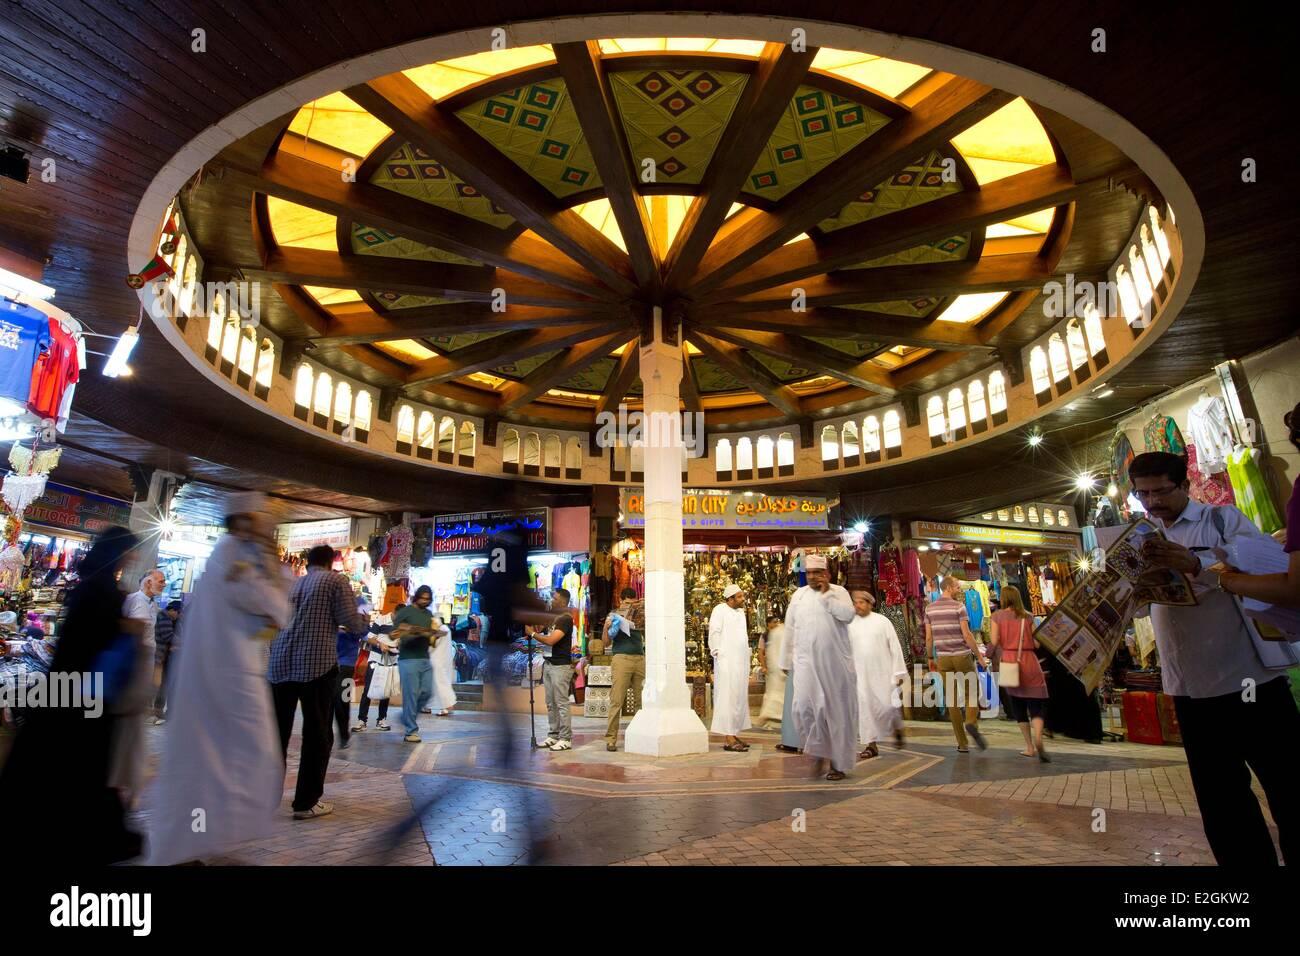 Sultanate of Oman Muscat Mutrah souk - Stock Image